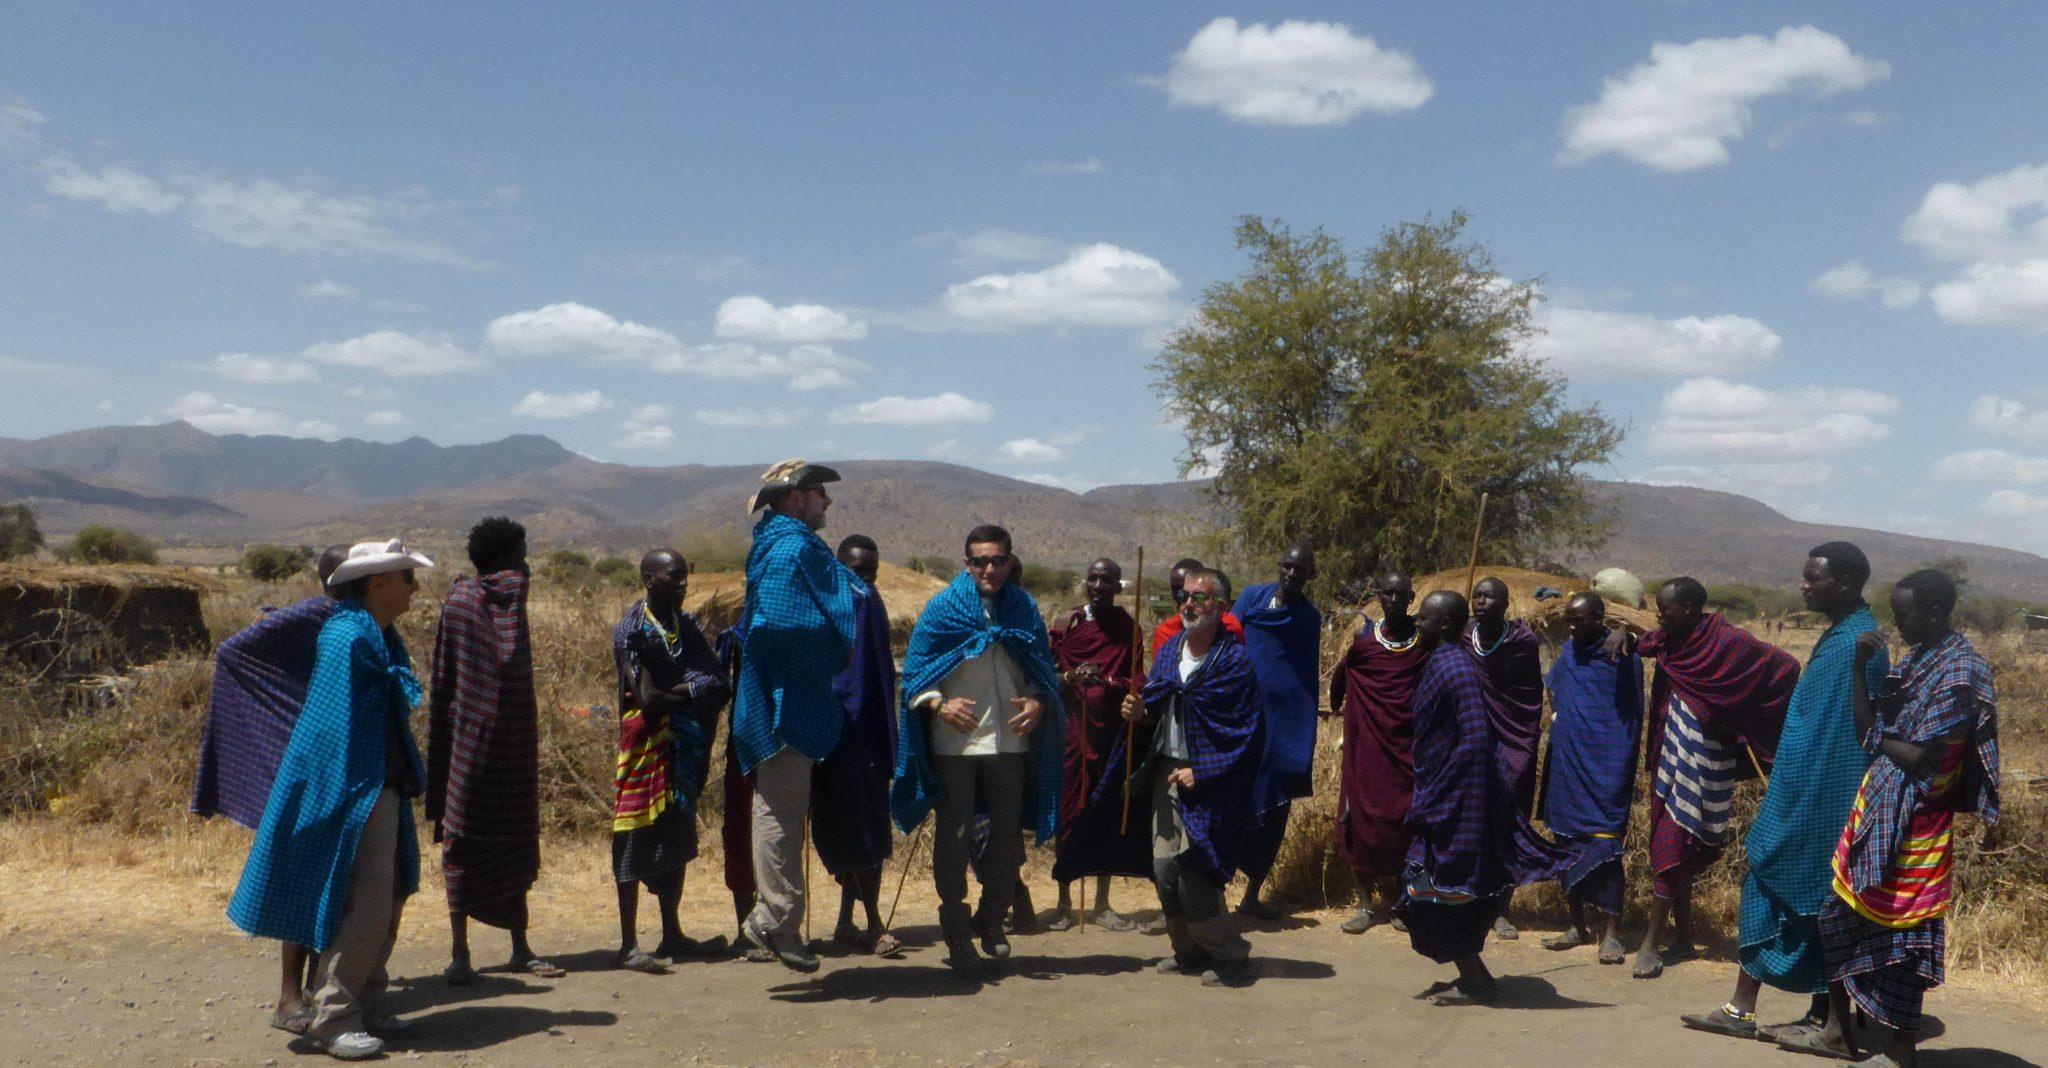 21-saltando-con-los-masais